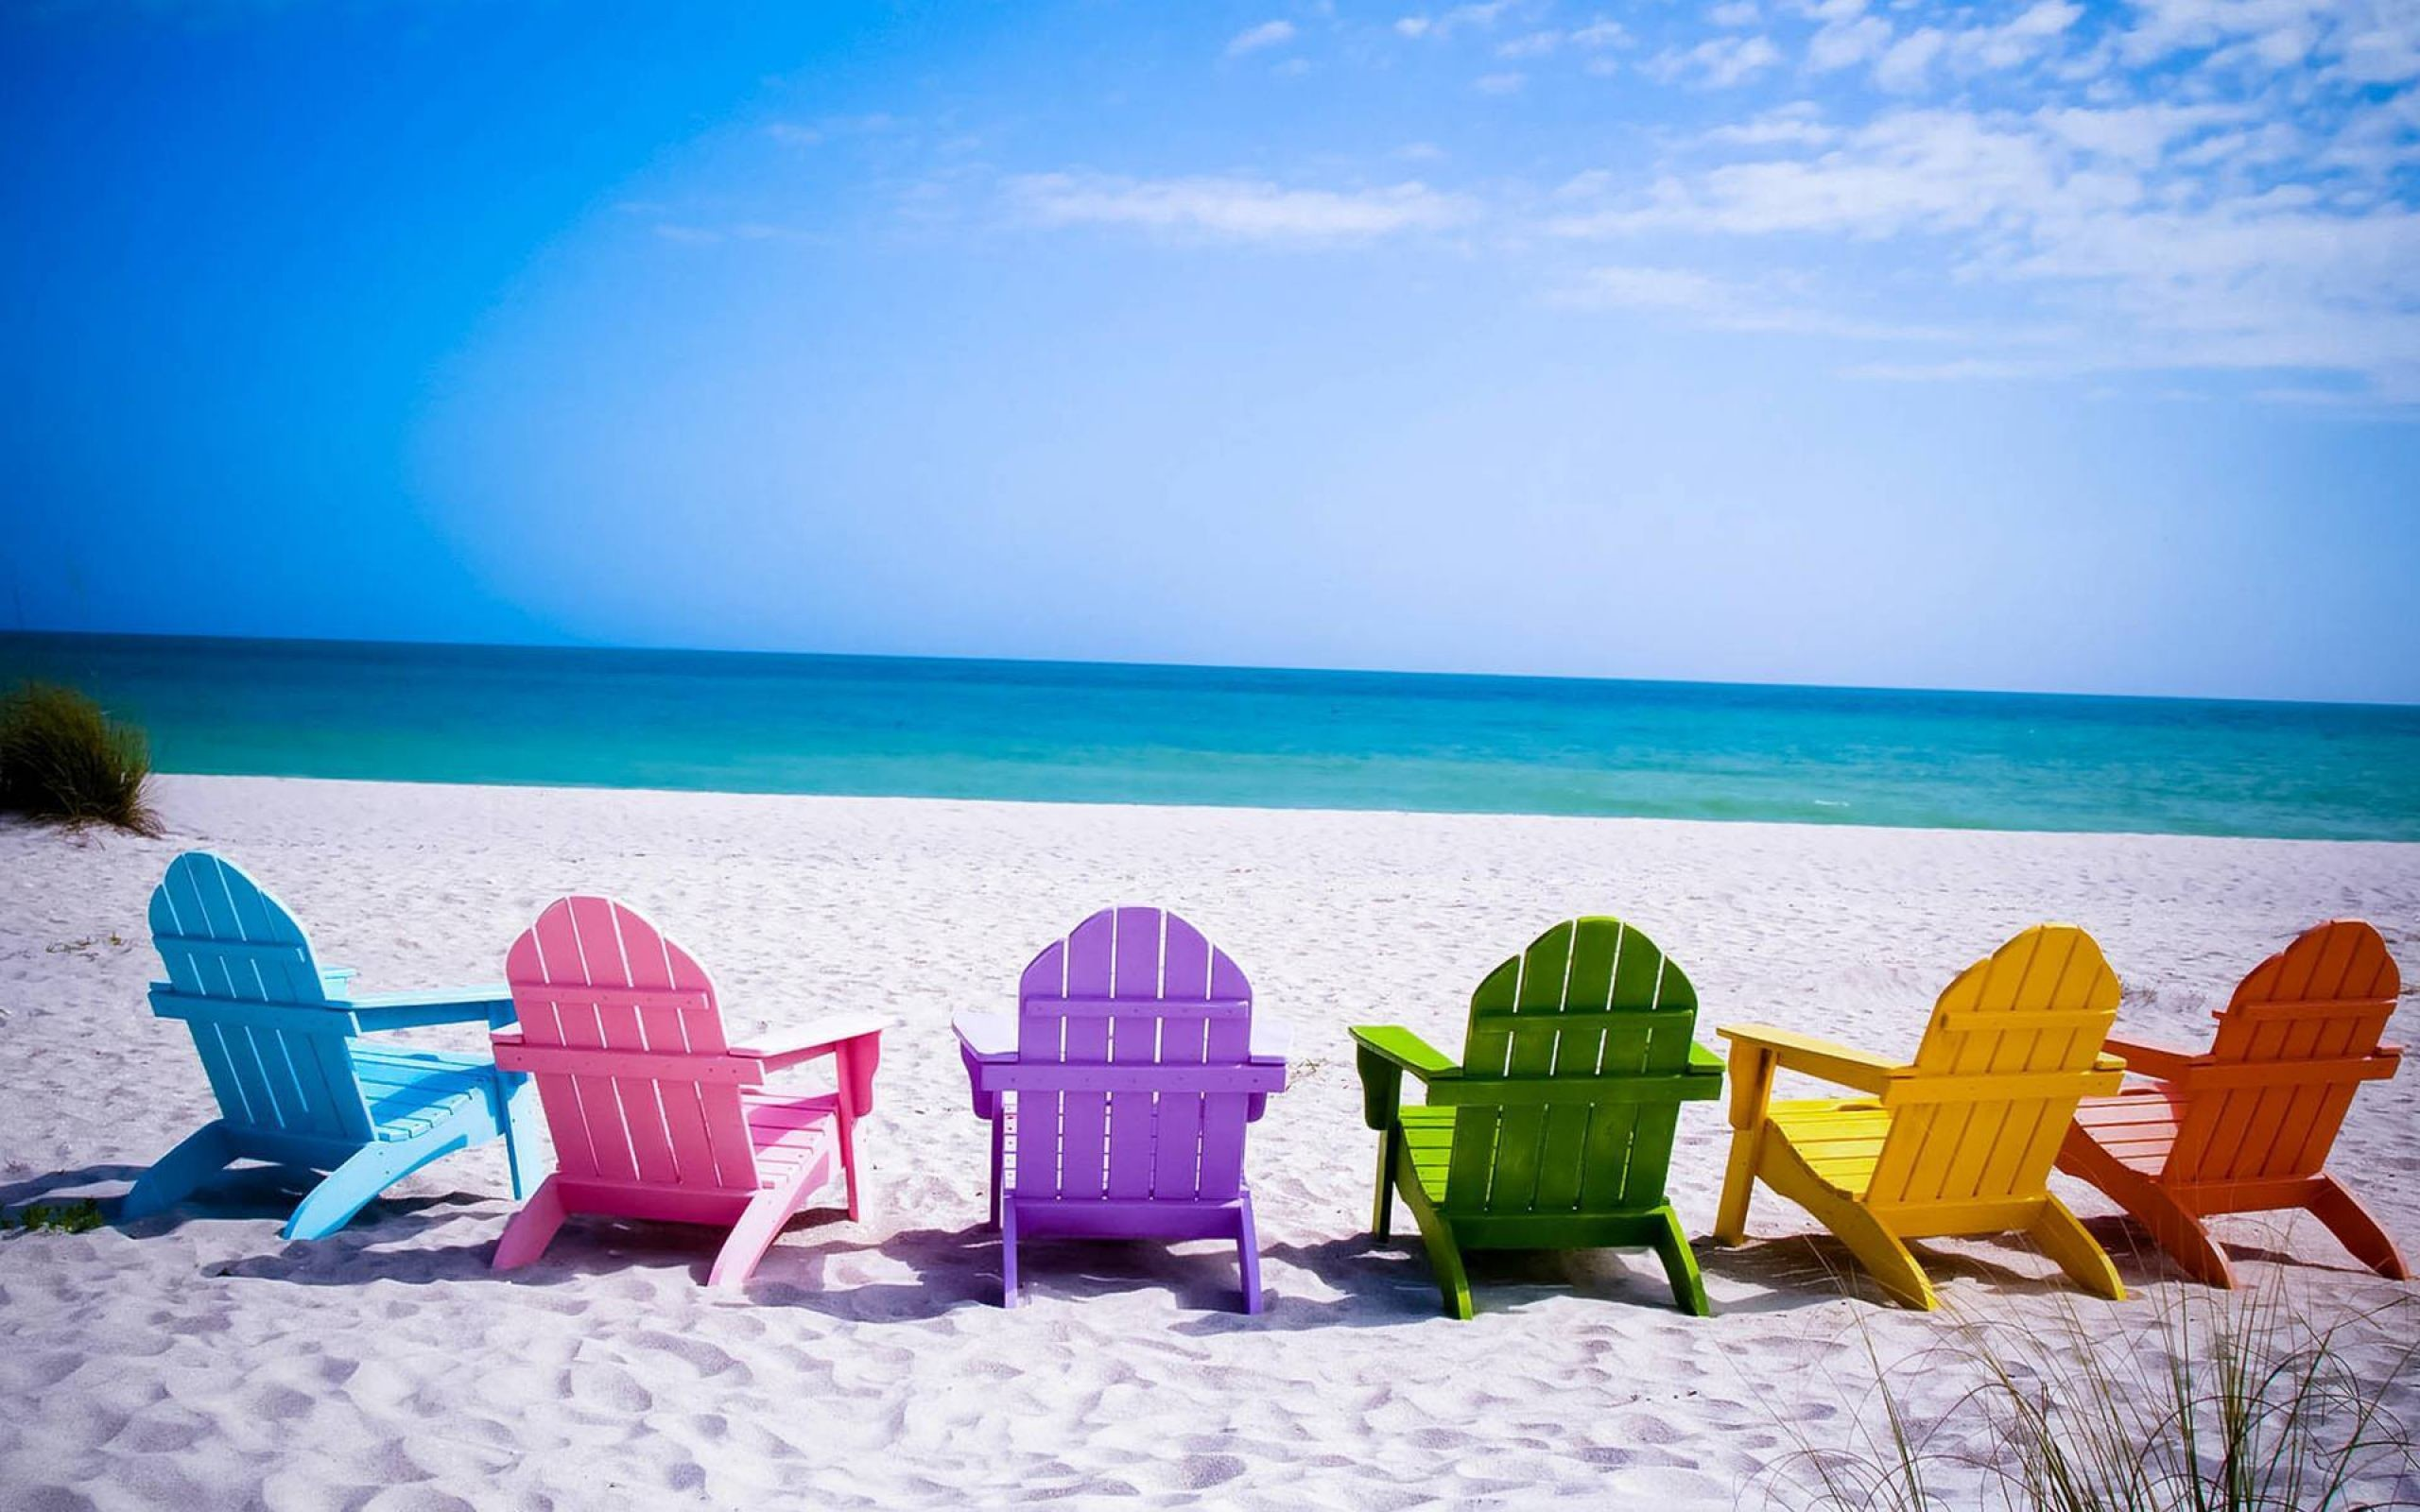 Summer Beach Scenes Wallpaper (45+ Images